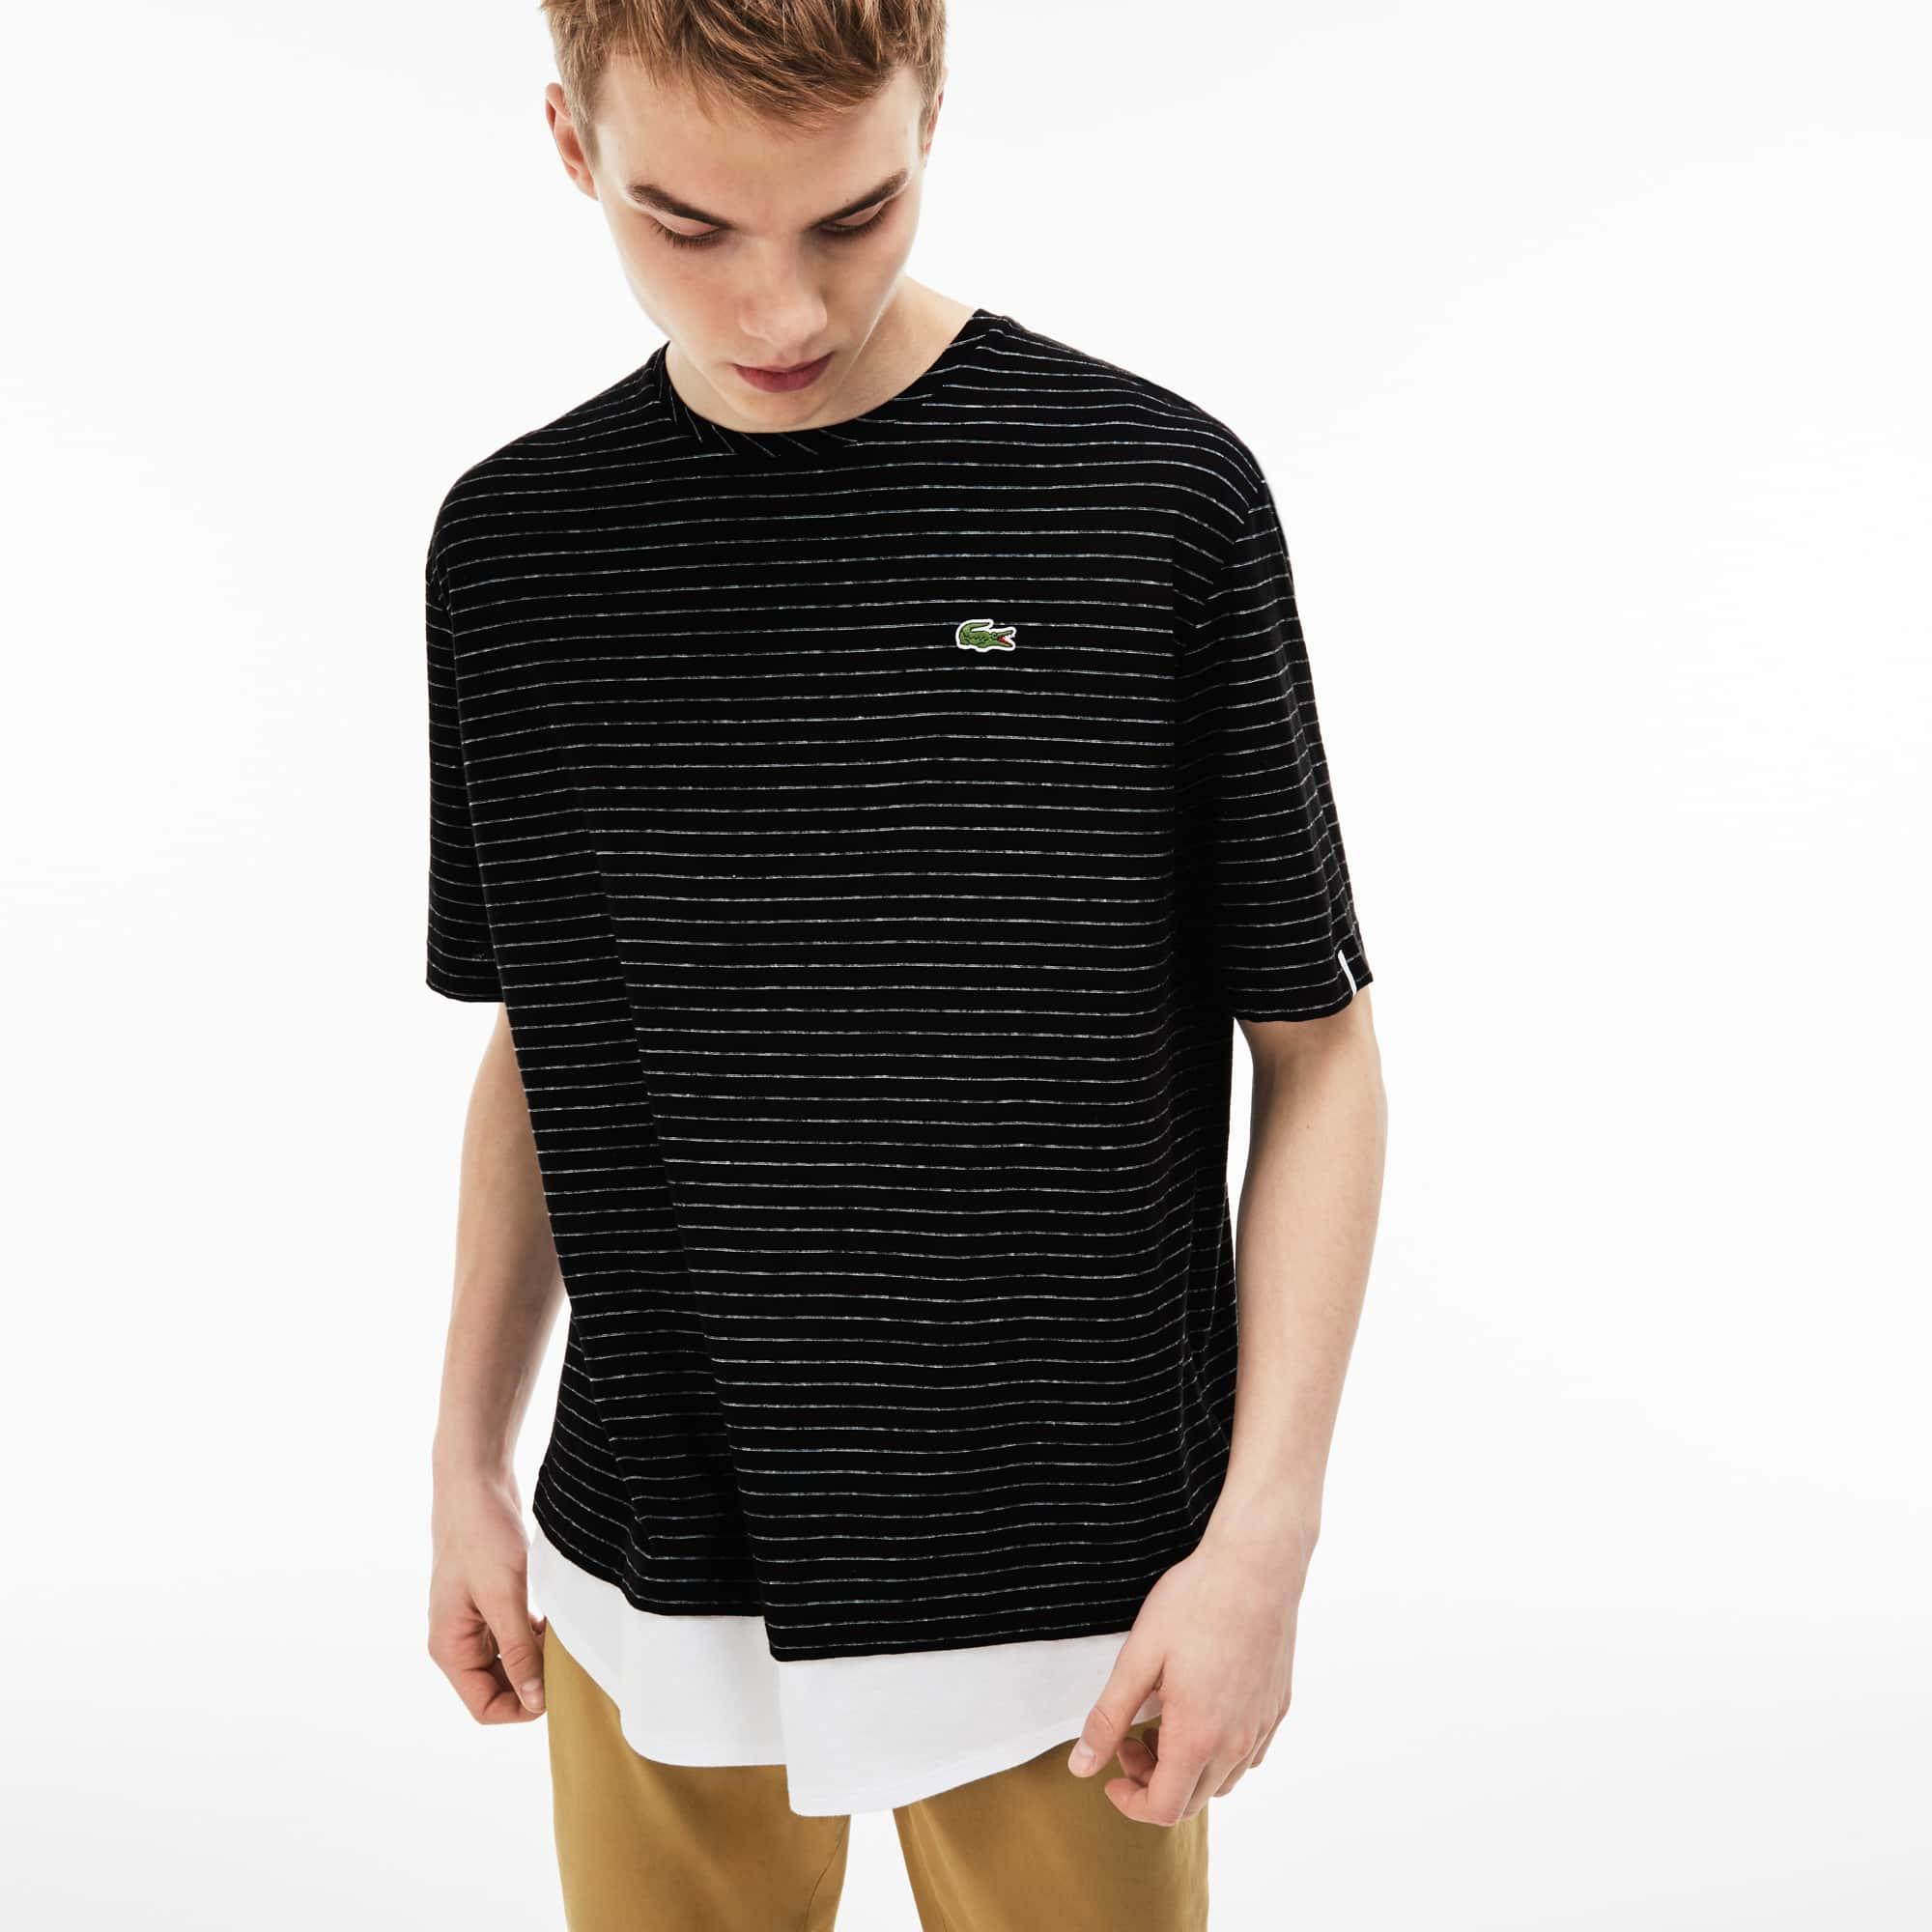 Men's Lacoste LIVE Crew Neck Striped Linen And Cotton Jersey T-shirt